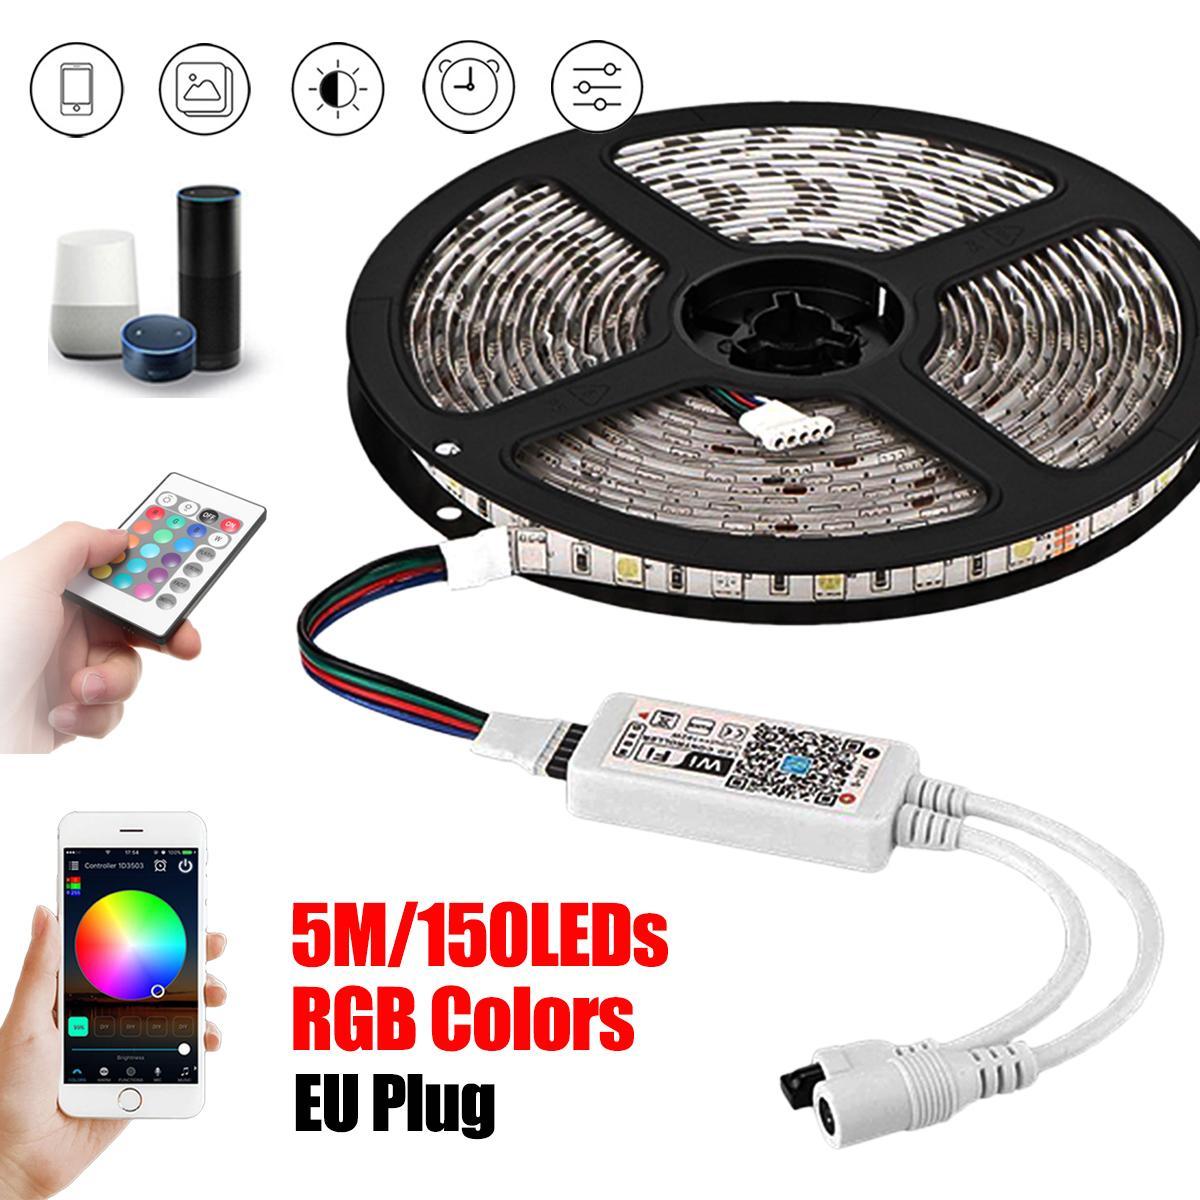 5M 16 4Ft Smart Wifi Rgb 150 Led Strip Lights For Echo Alexa Google Home Ir Eu Plug Intl Coupon